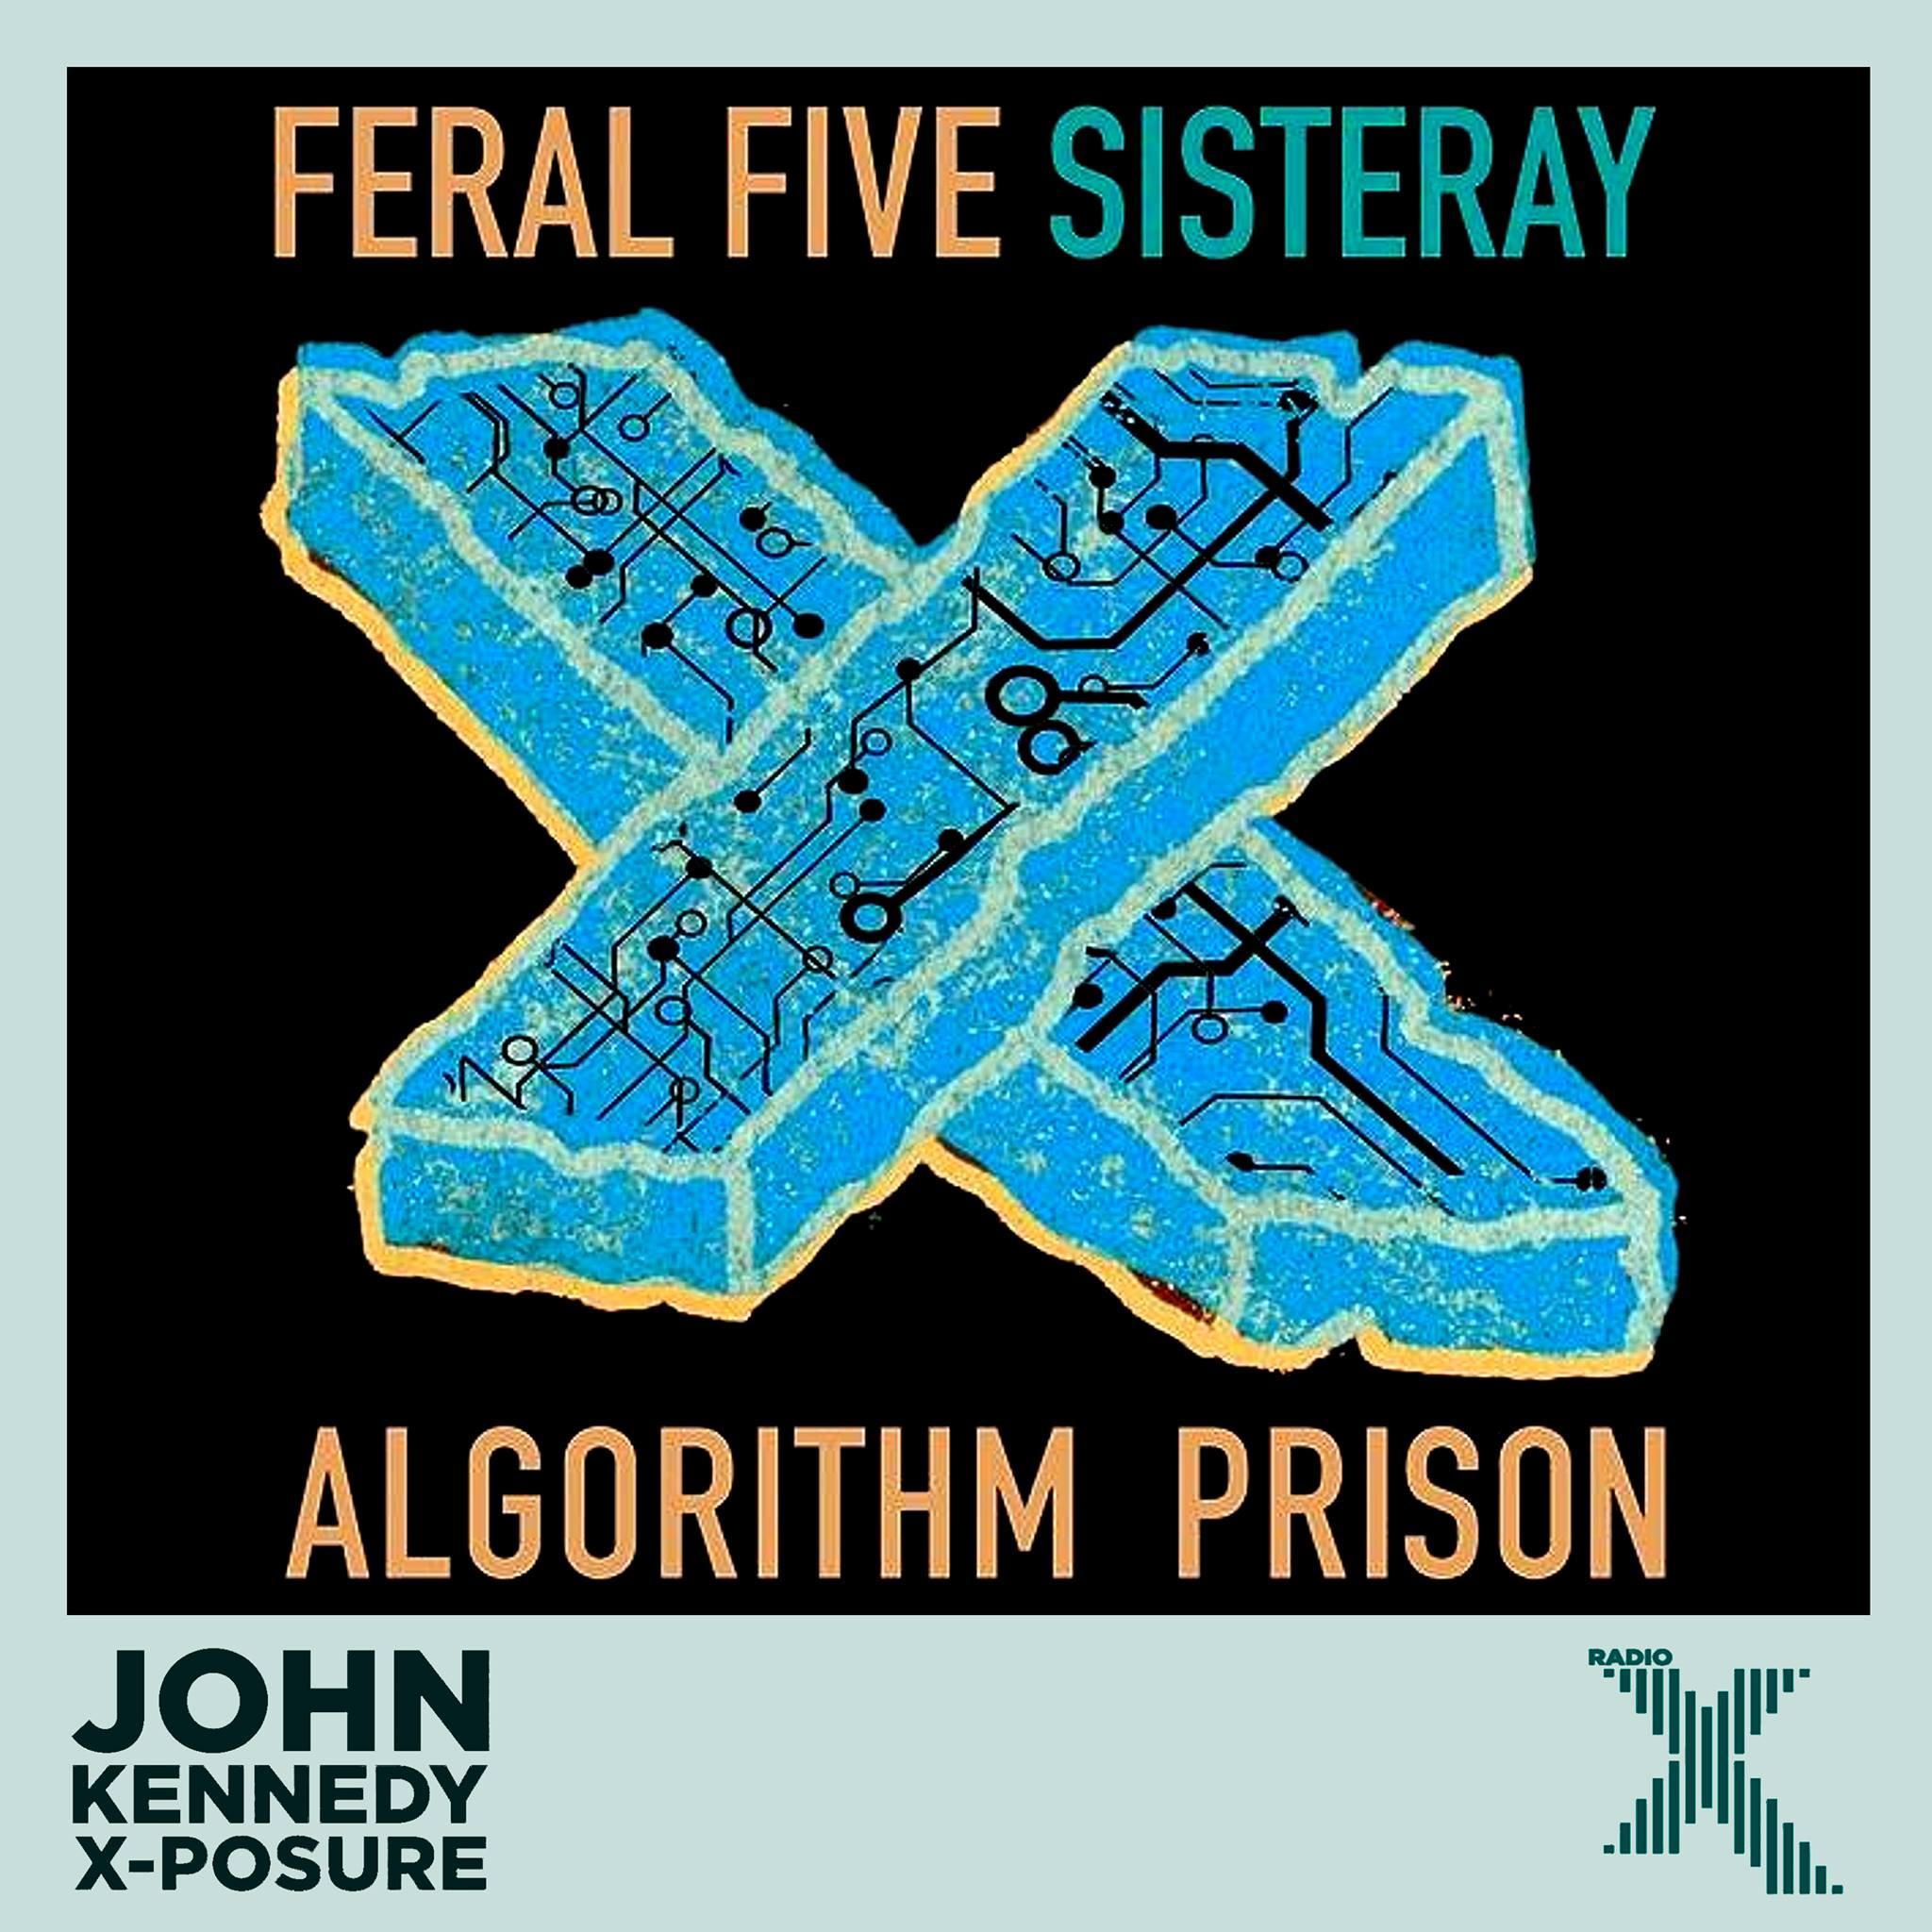 Feral Five, Sisteray, Algorithm Prison Reconstructed, X-Posure, John Kennedy, Radio X, single, electronica, electropunk, electro, punk, London, synth, remix